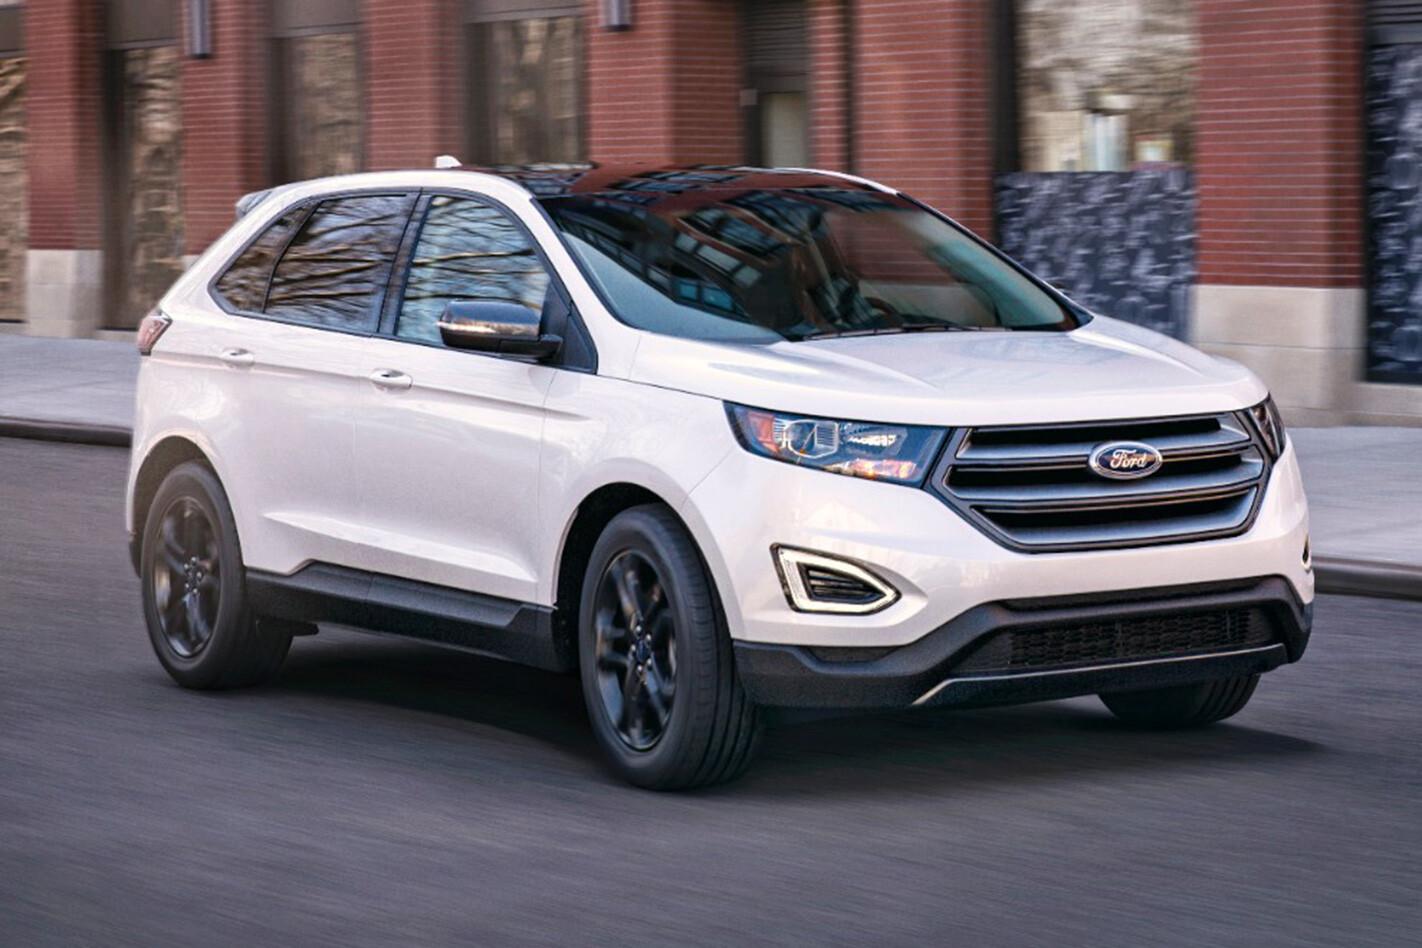 2017 Ford Edge (US model shown)